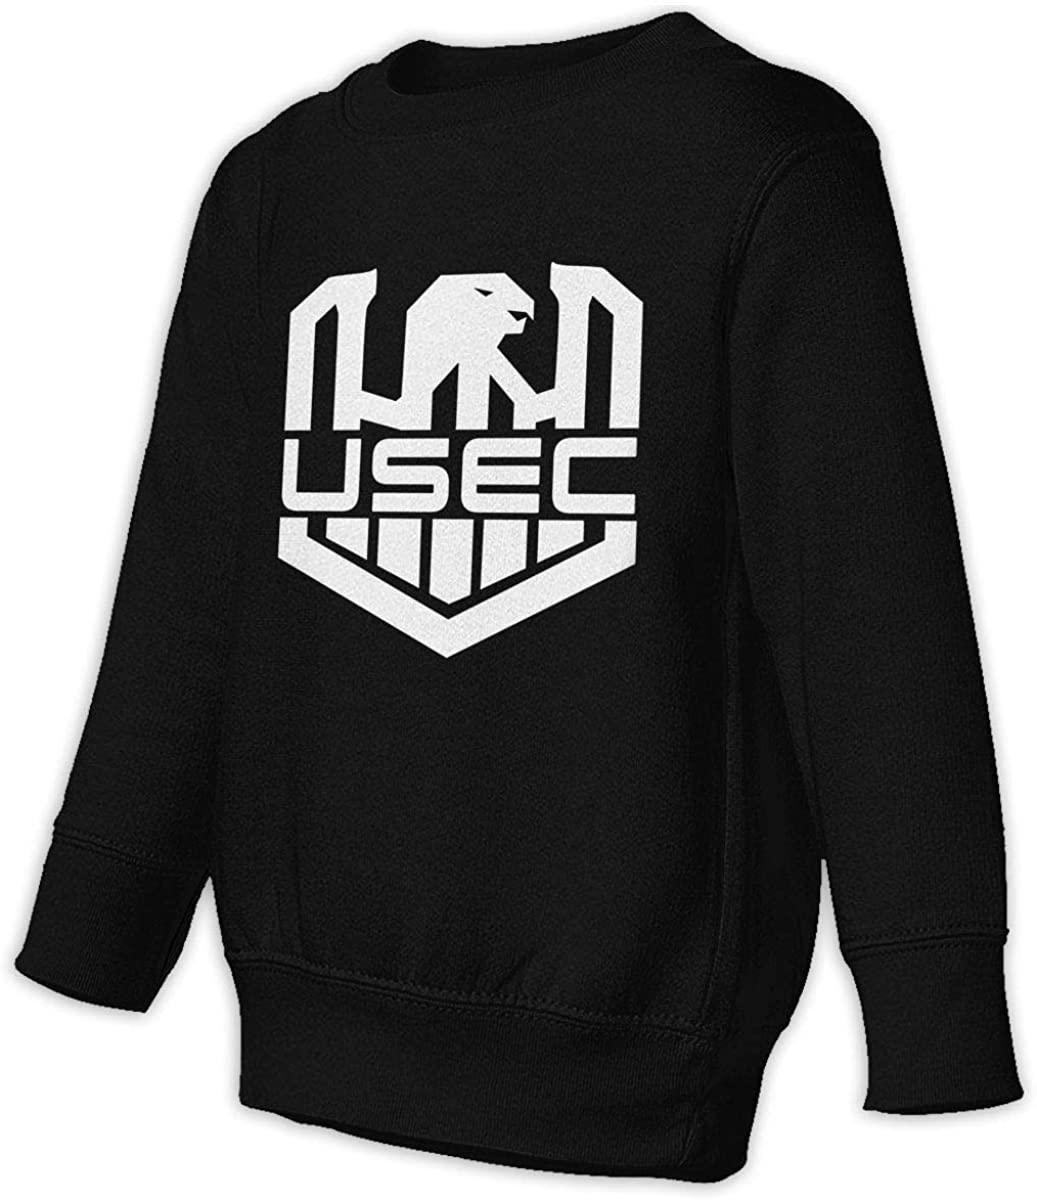 1836 Escape from Tarkov Usec Unisex Sweatshirt Youth Boy and Girls Pullover Sweatshirt